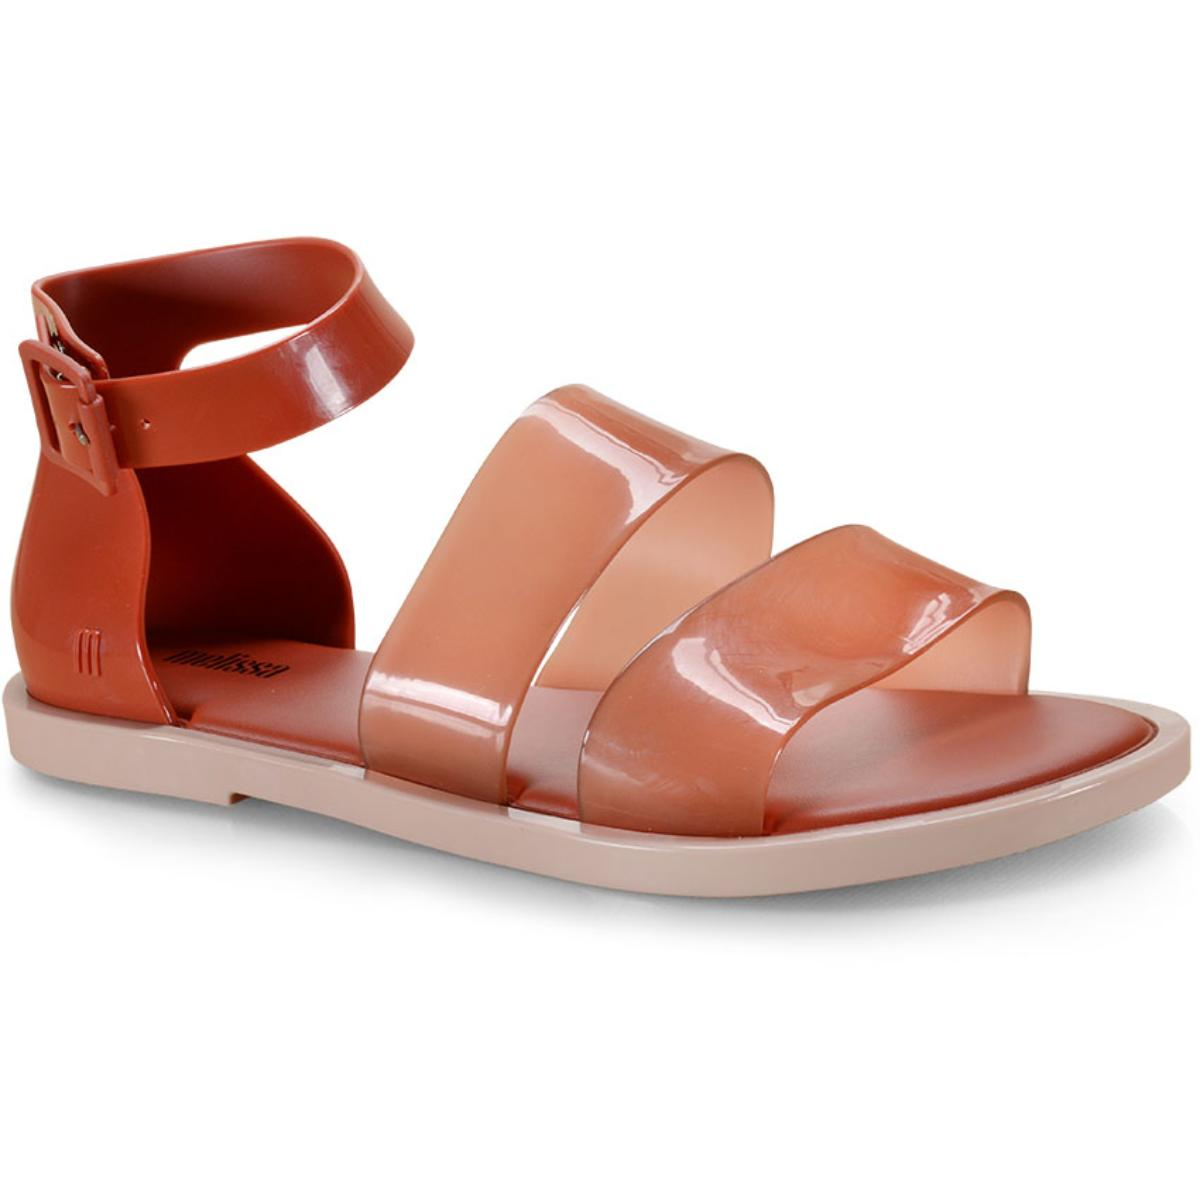 Sandália Feminina Melissa 32797 51387 Model Sandal Bege/marrom